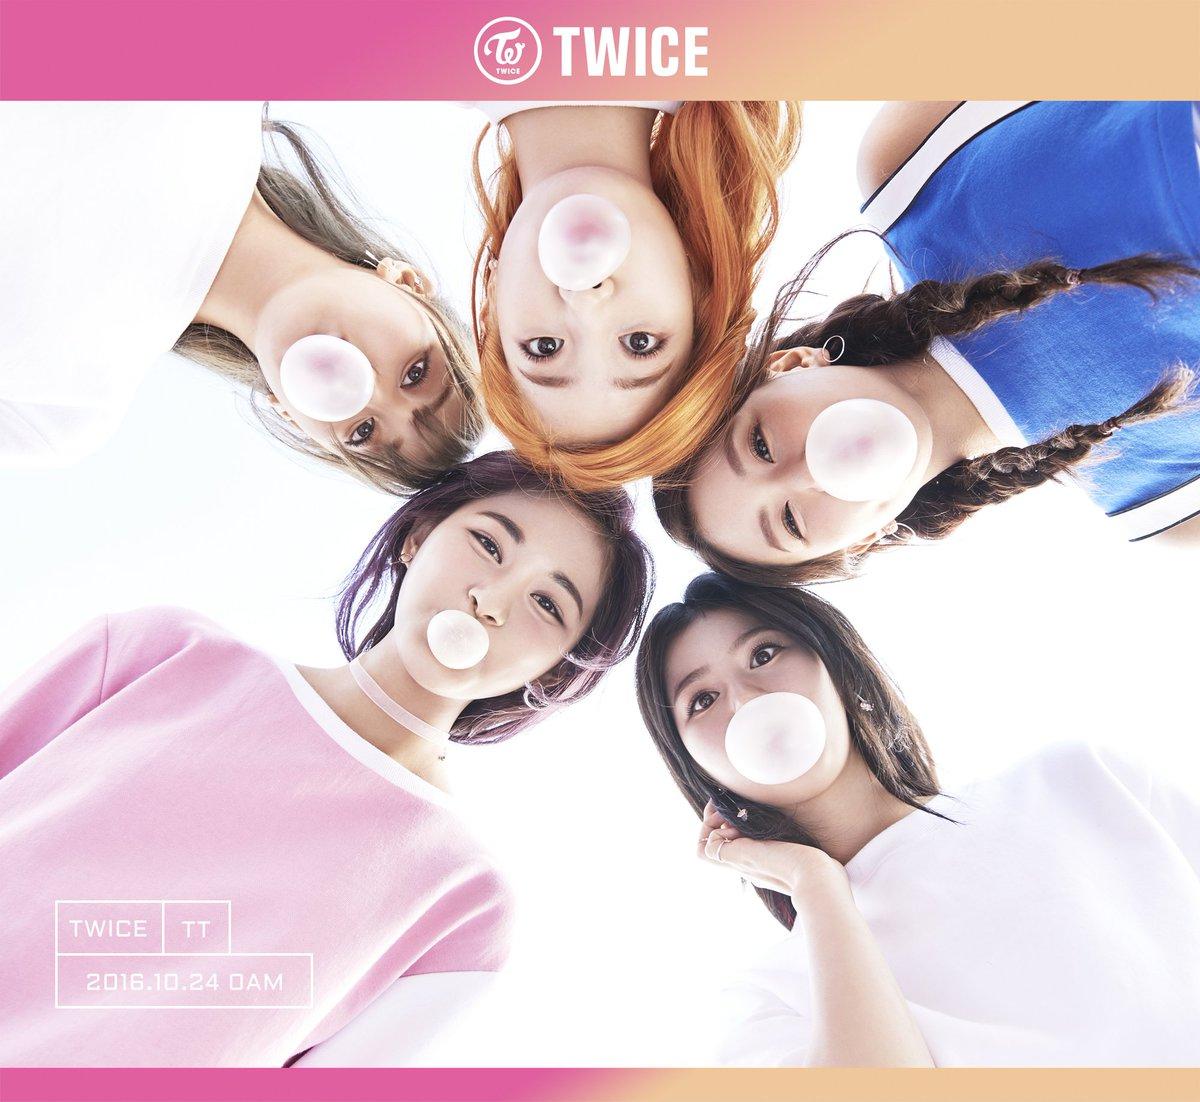 twice tt